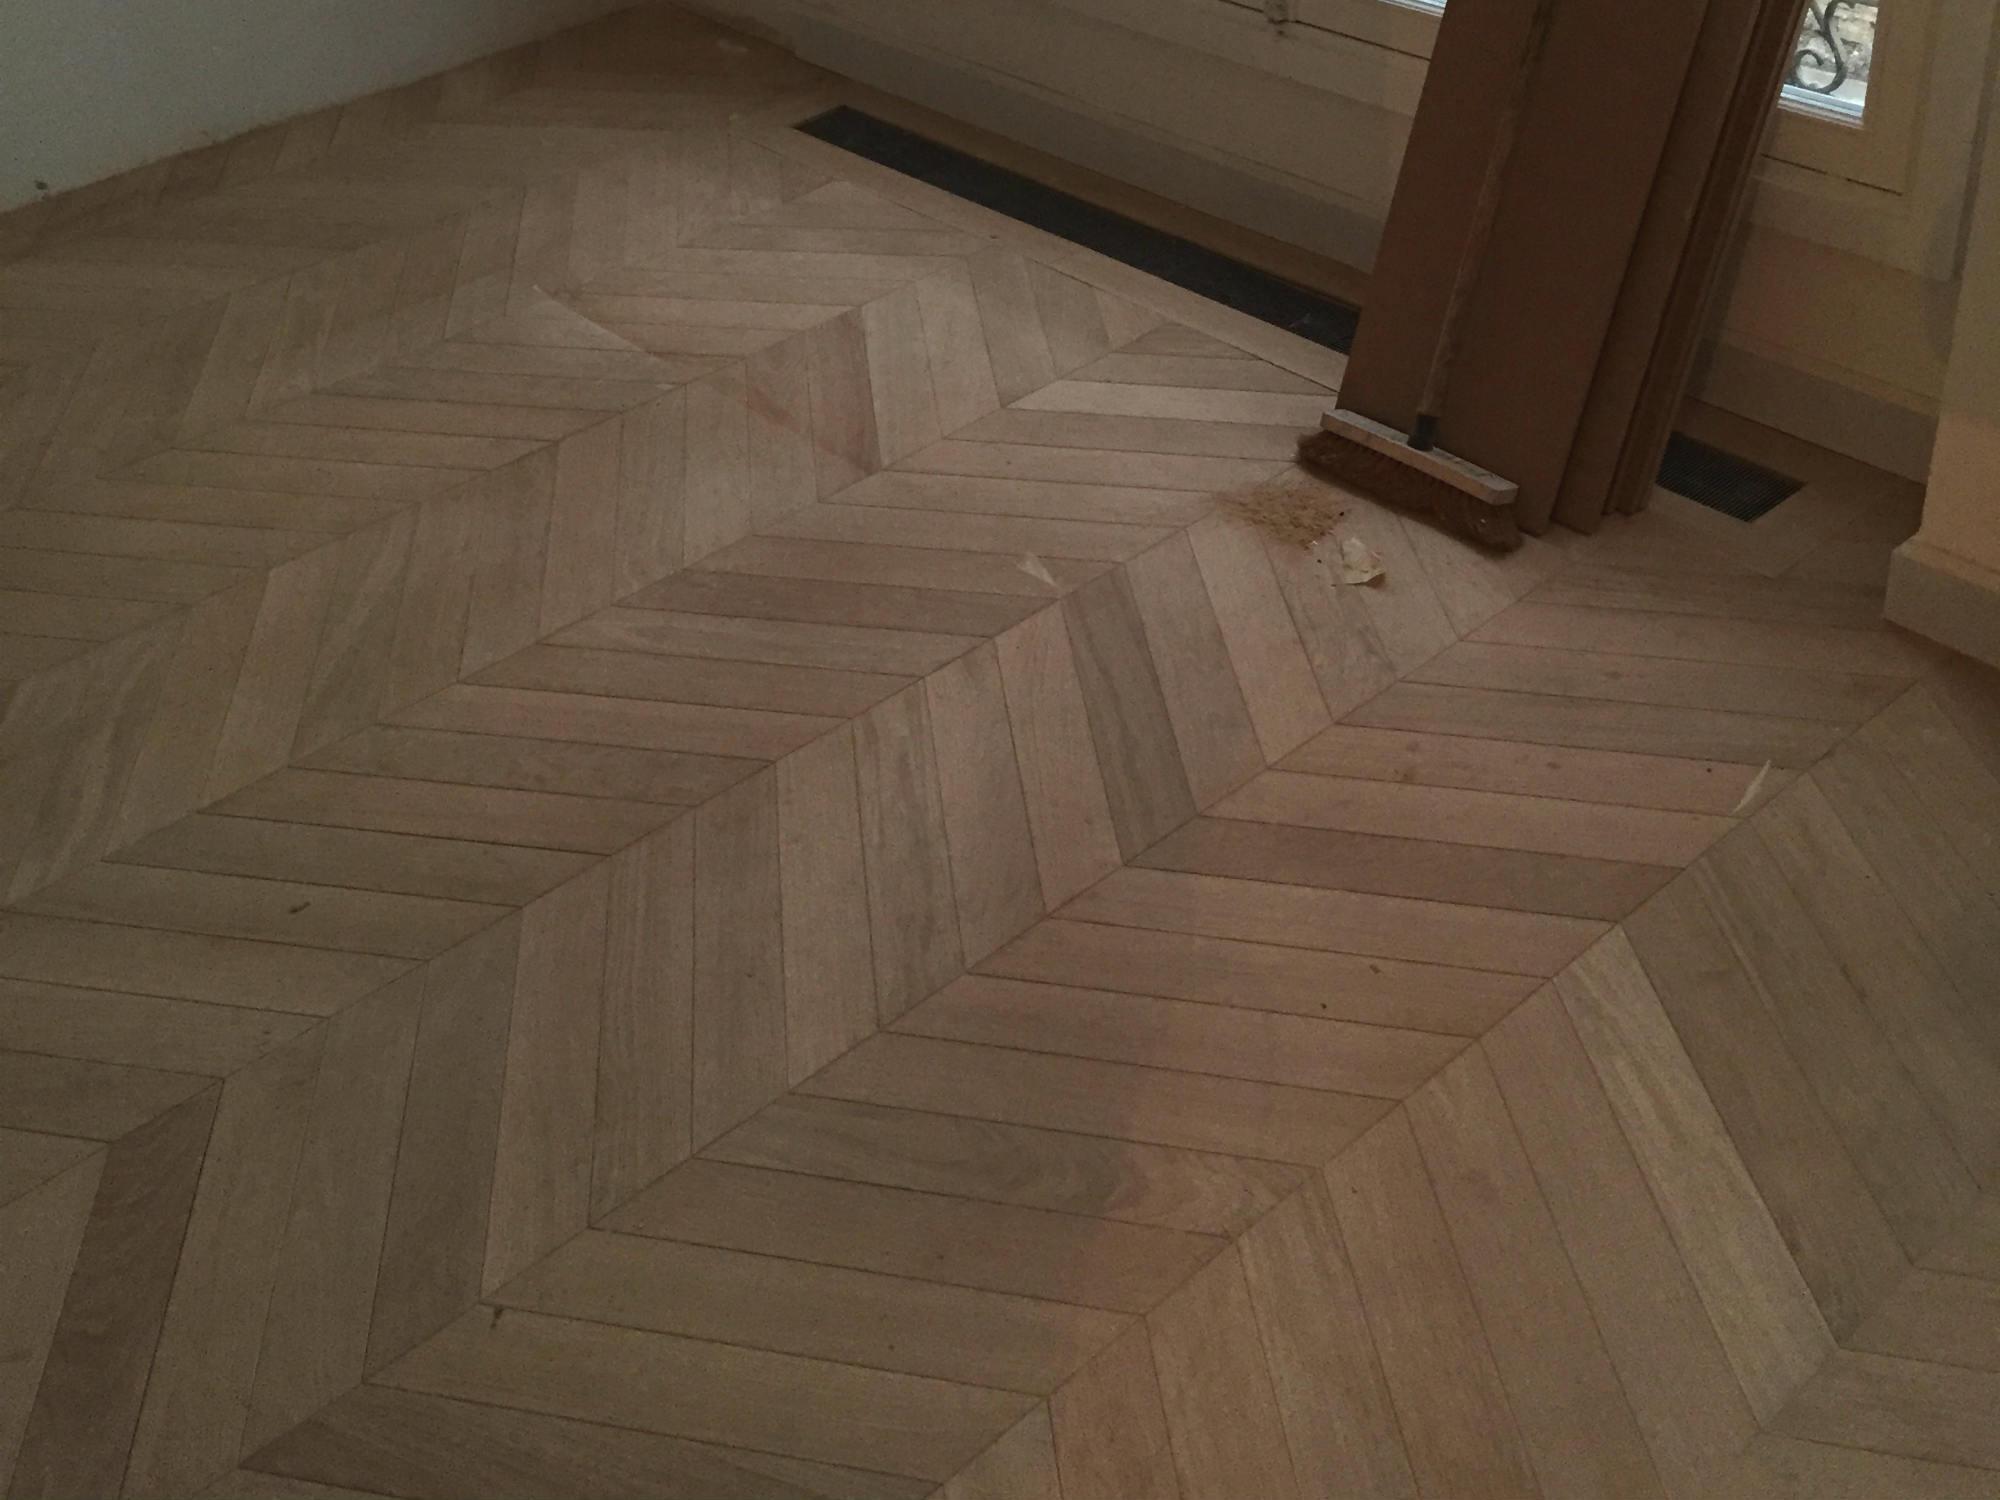 2016 travaux renovation appartement transformation F2 en F3 Paris rue Damremont_Eolh btp france 2